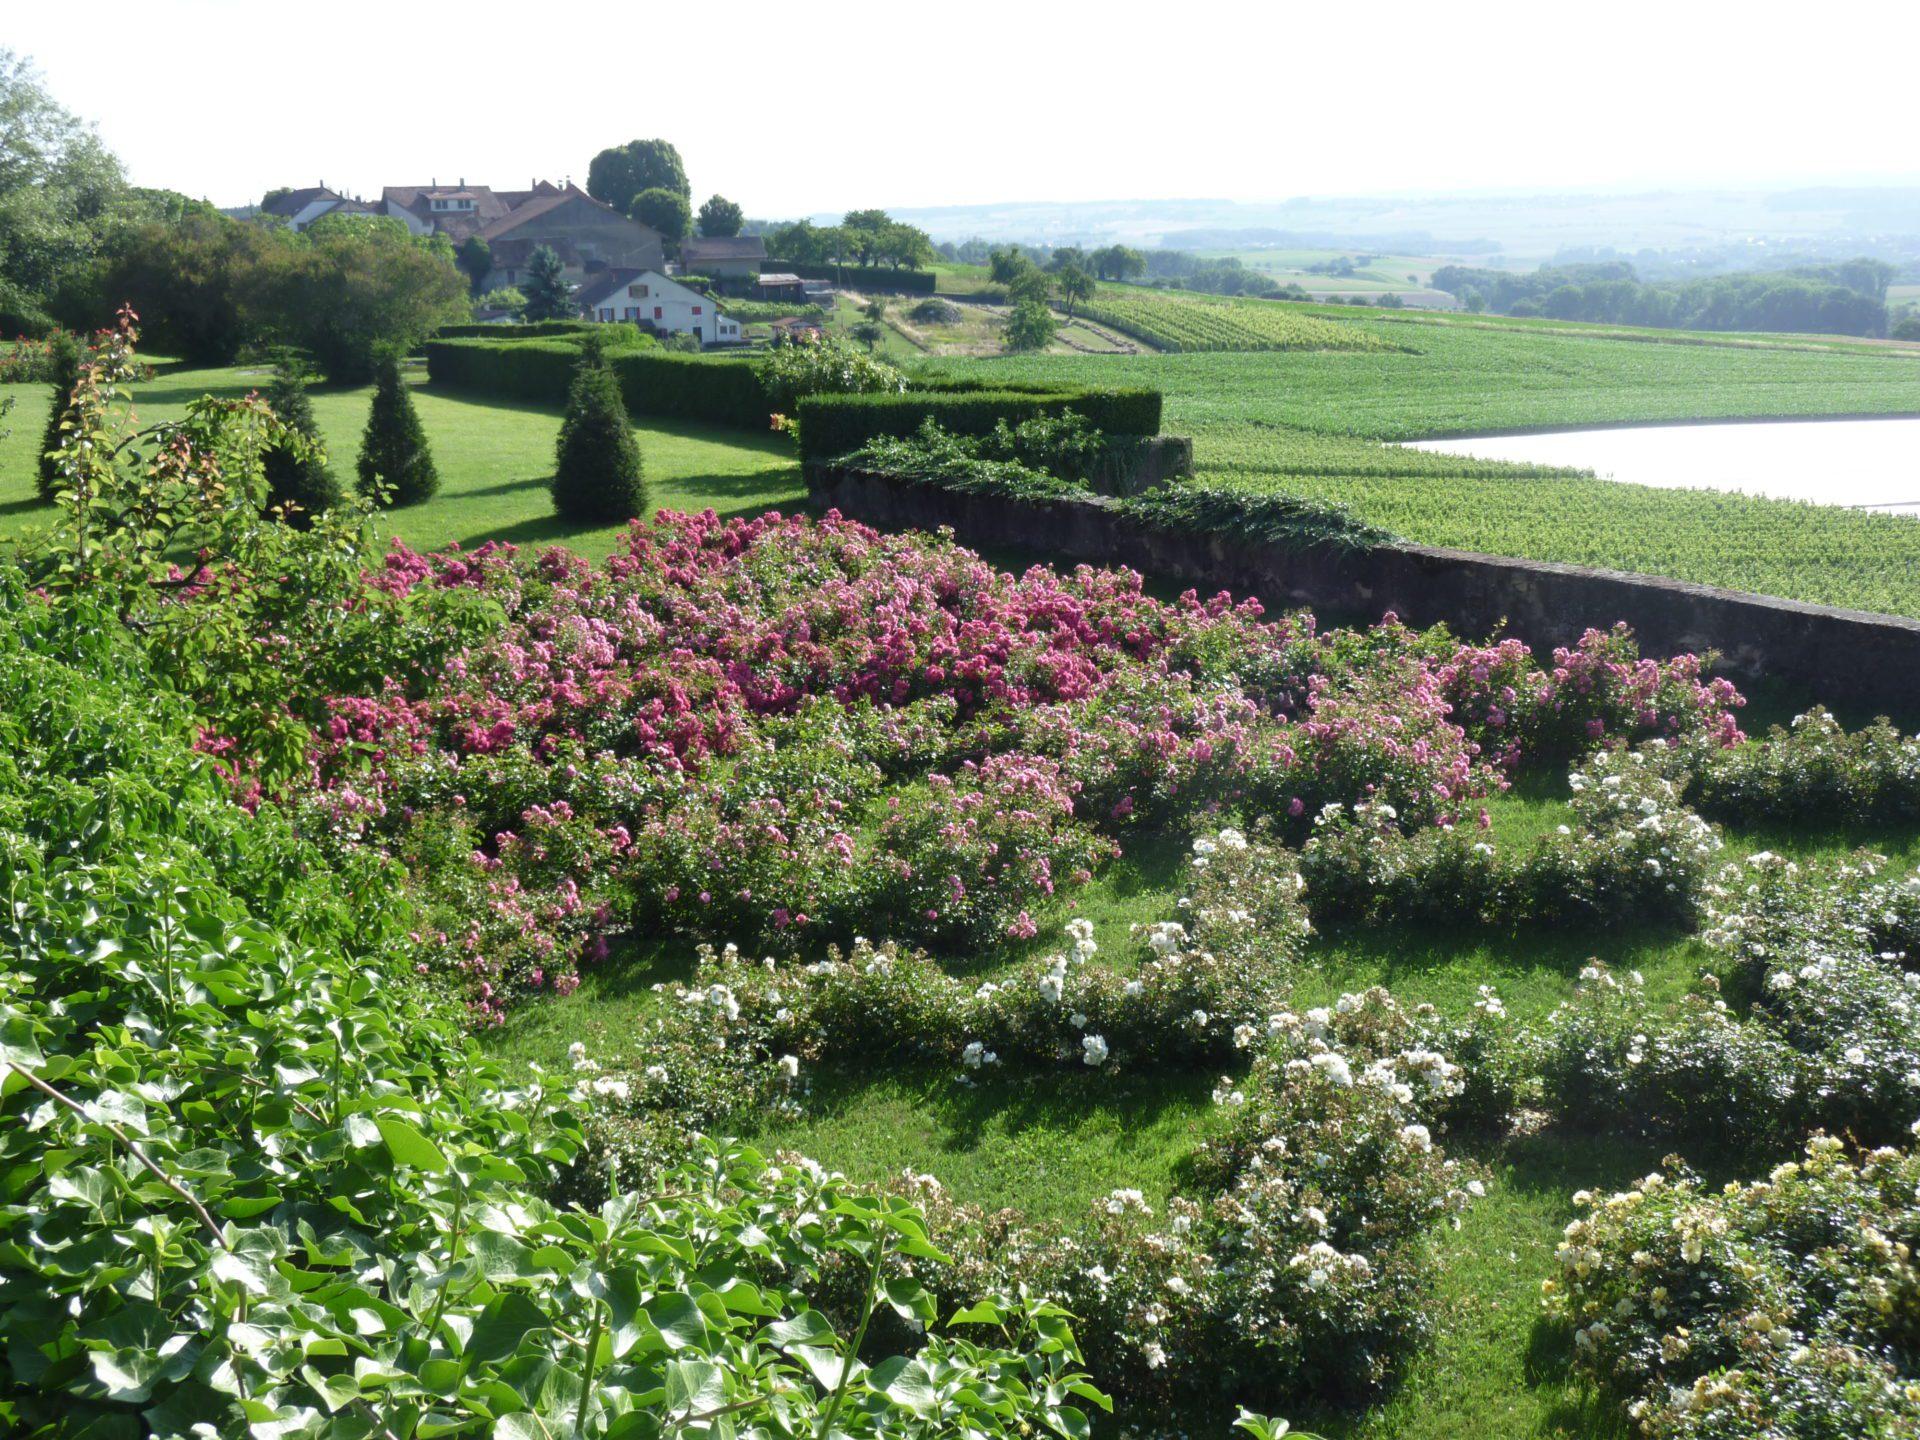 jardindesiris_dorianne's_garden_roses